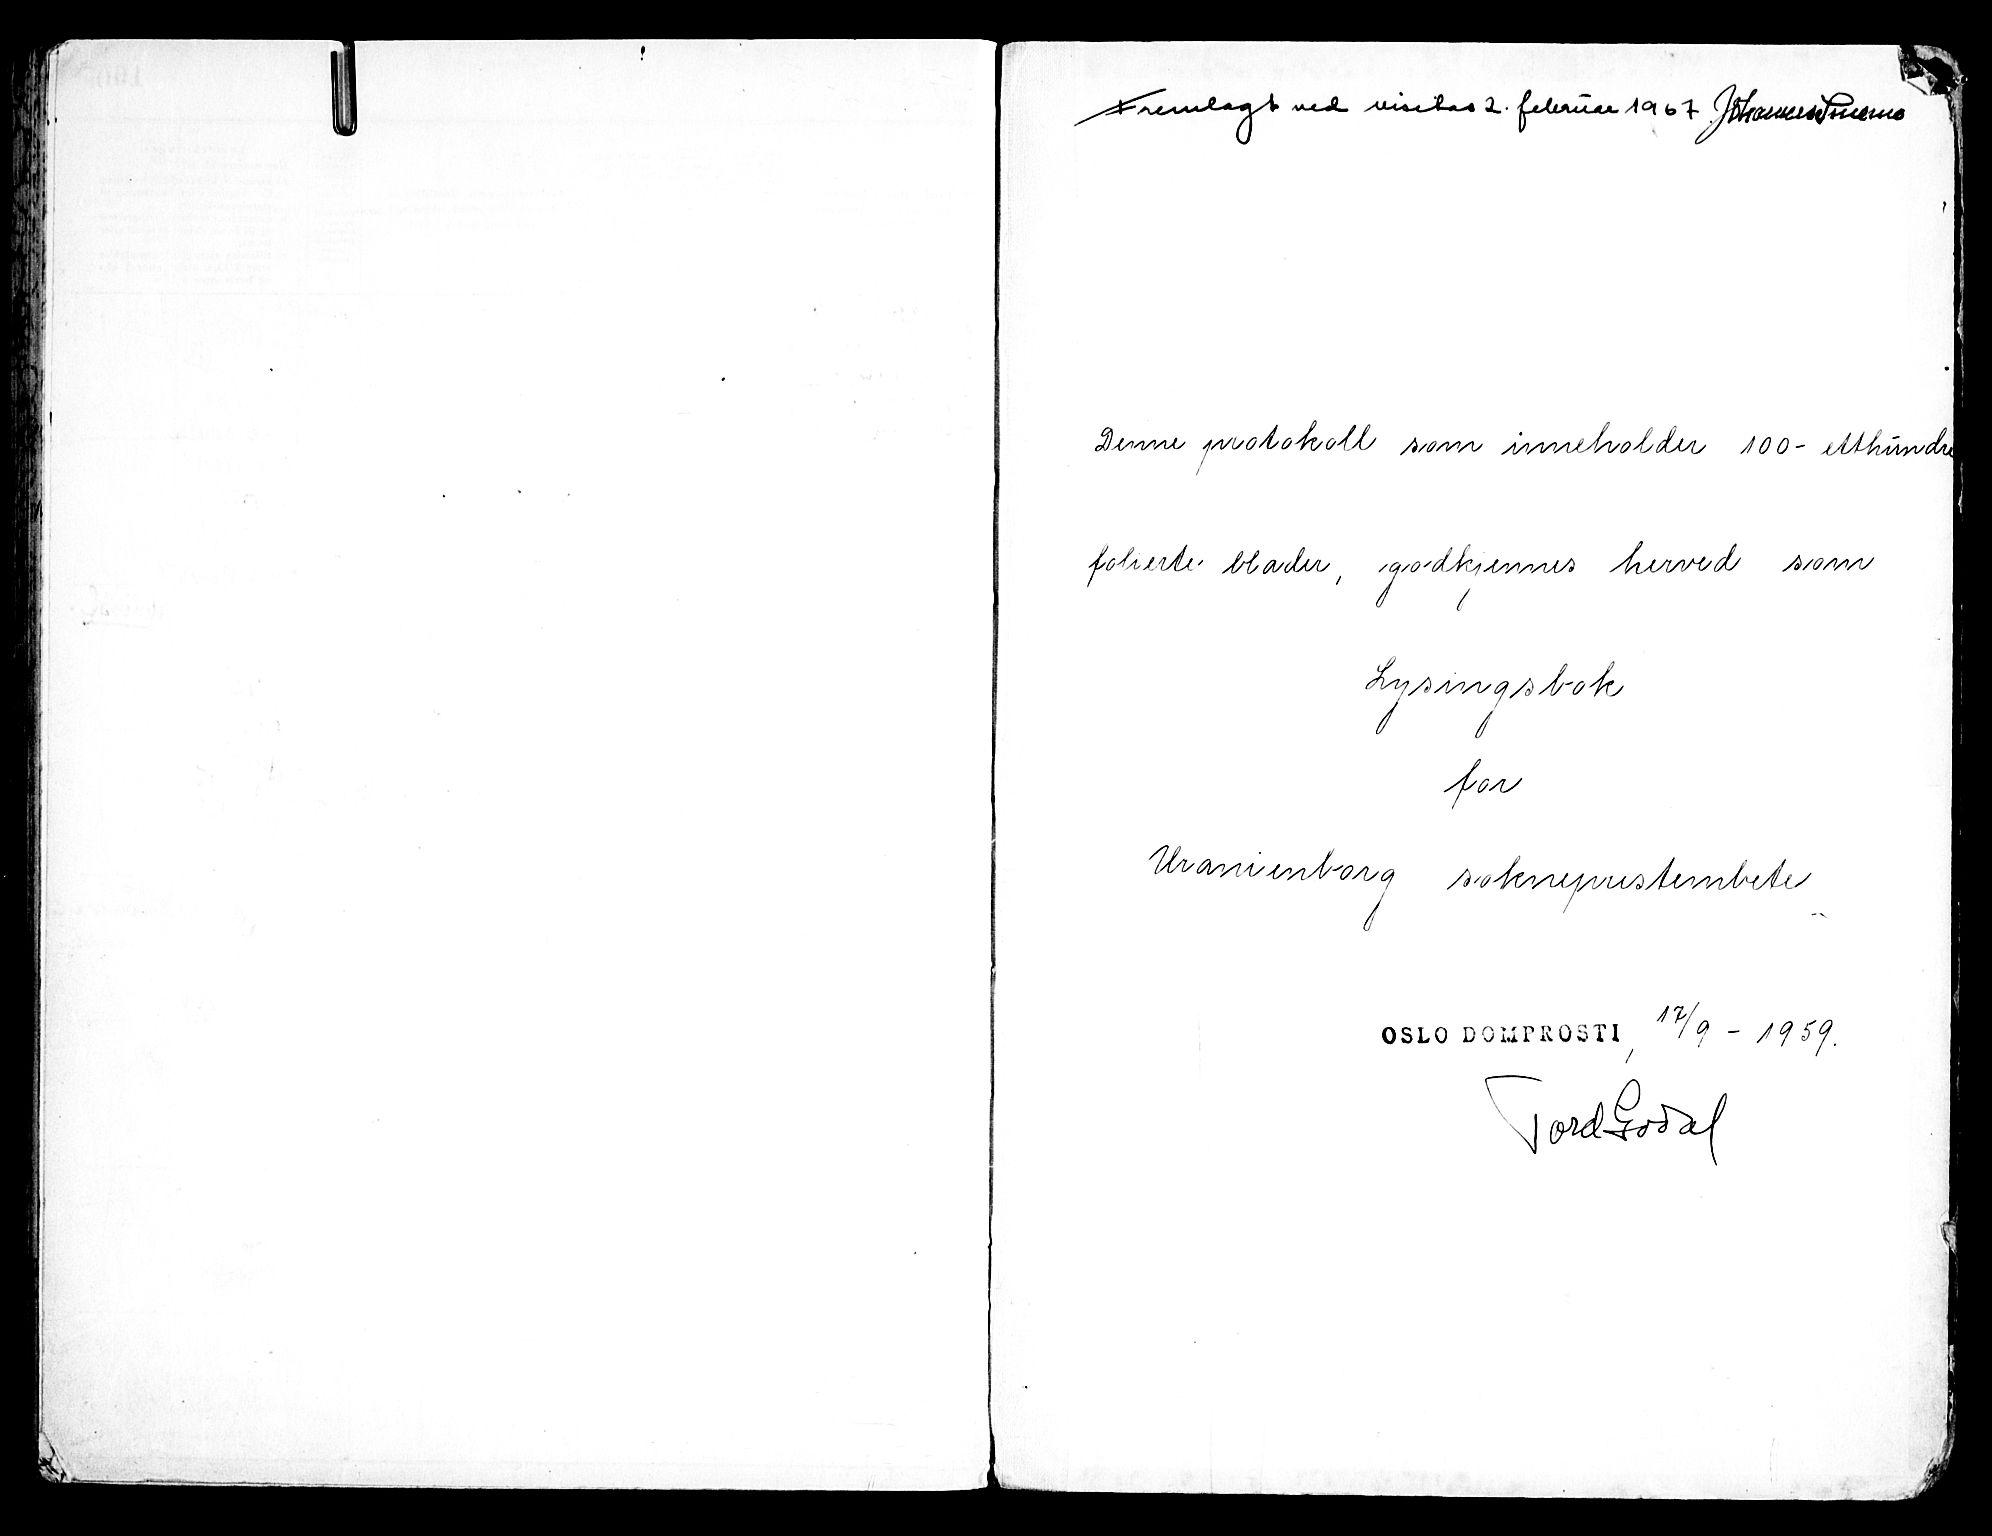 SAO, Uranienborg prestekontor Kirkebøker, H/Hb/L0003: Lysningsprotokoll nr. II 3, 1959-1963